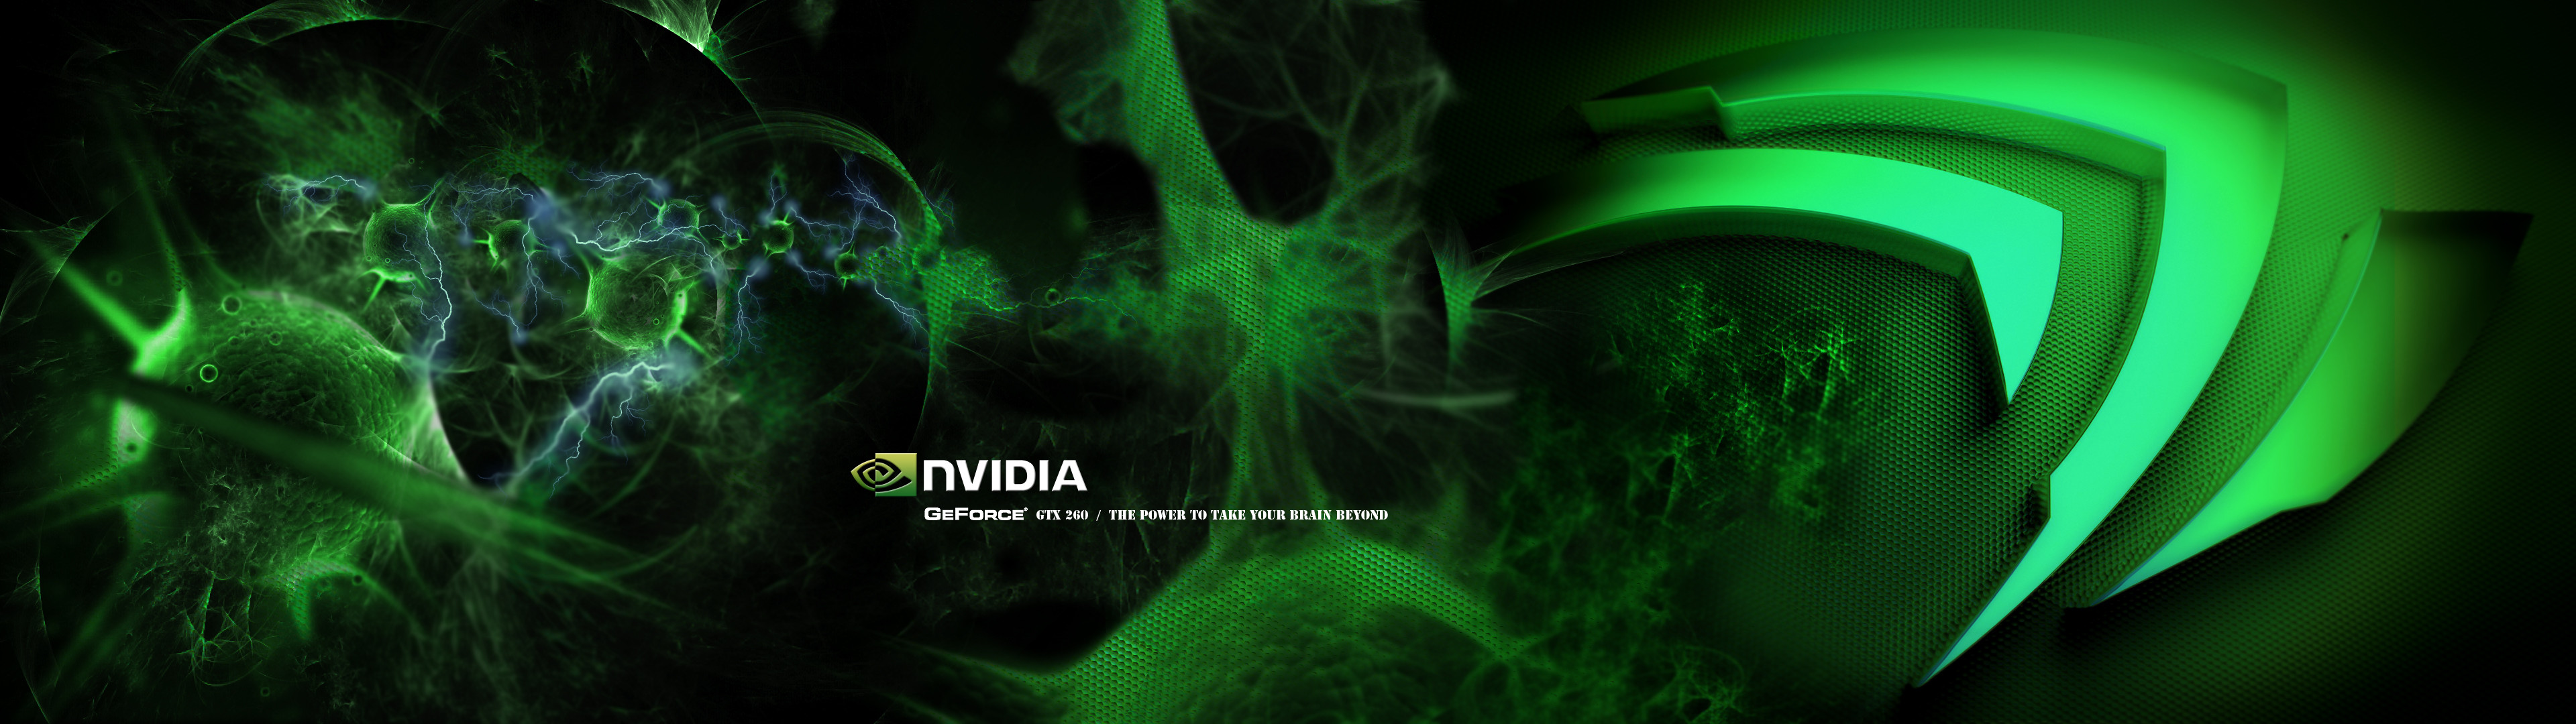 NVIDIA Triple Monitor Wallpaper